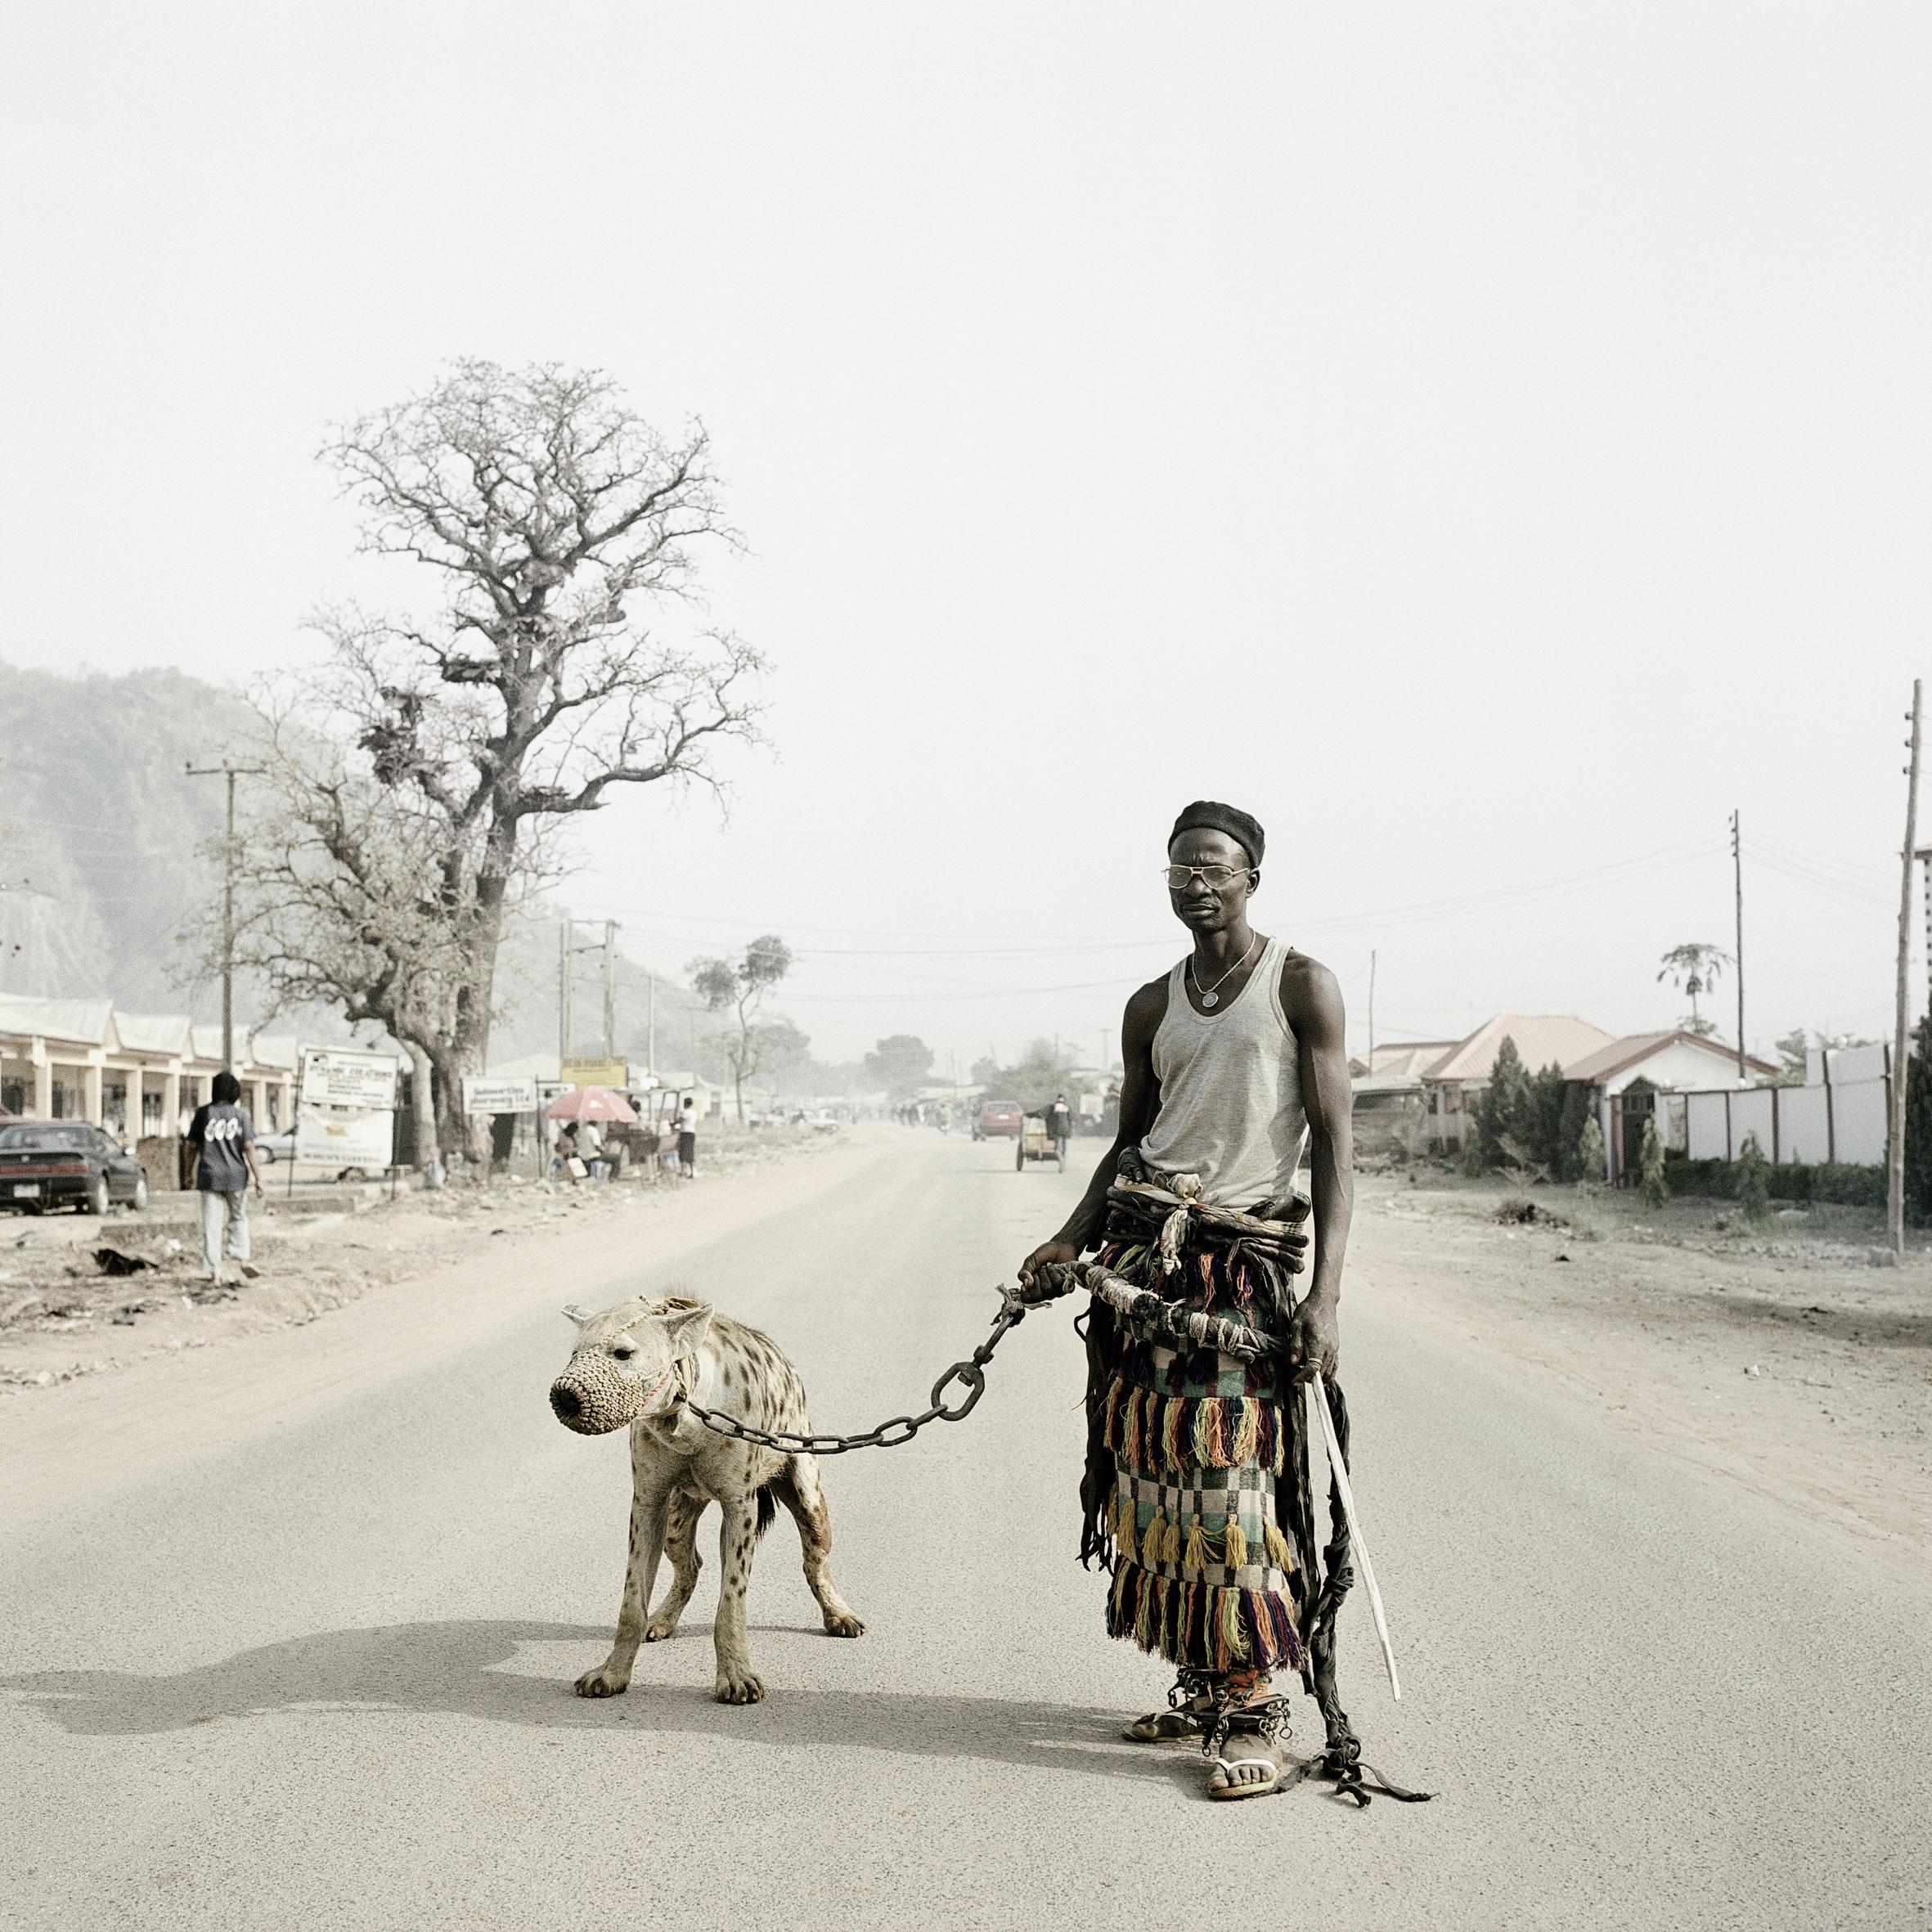 Pieter Hugo - Mallam Galadima Ahmadu with Jamis, Abuja Nigeria  from the Stevenson Gallery South Africa